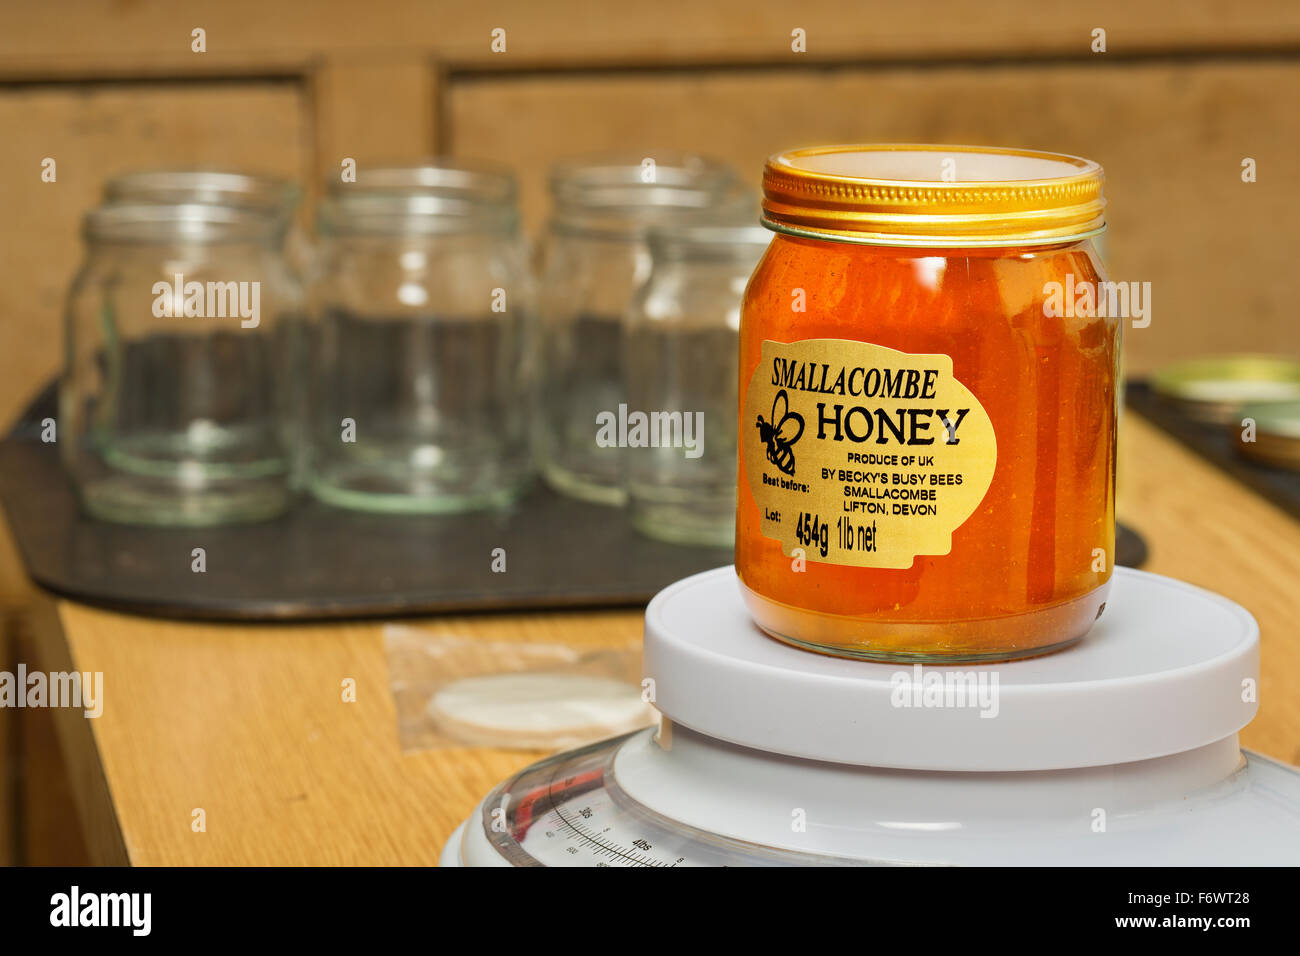 Bee keeping,honey production, - Stock Image